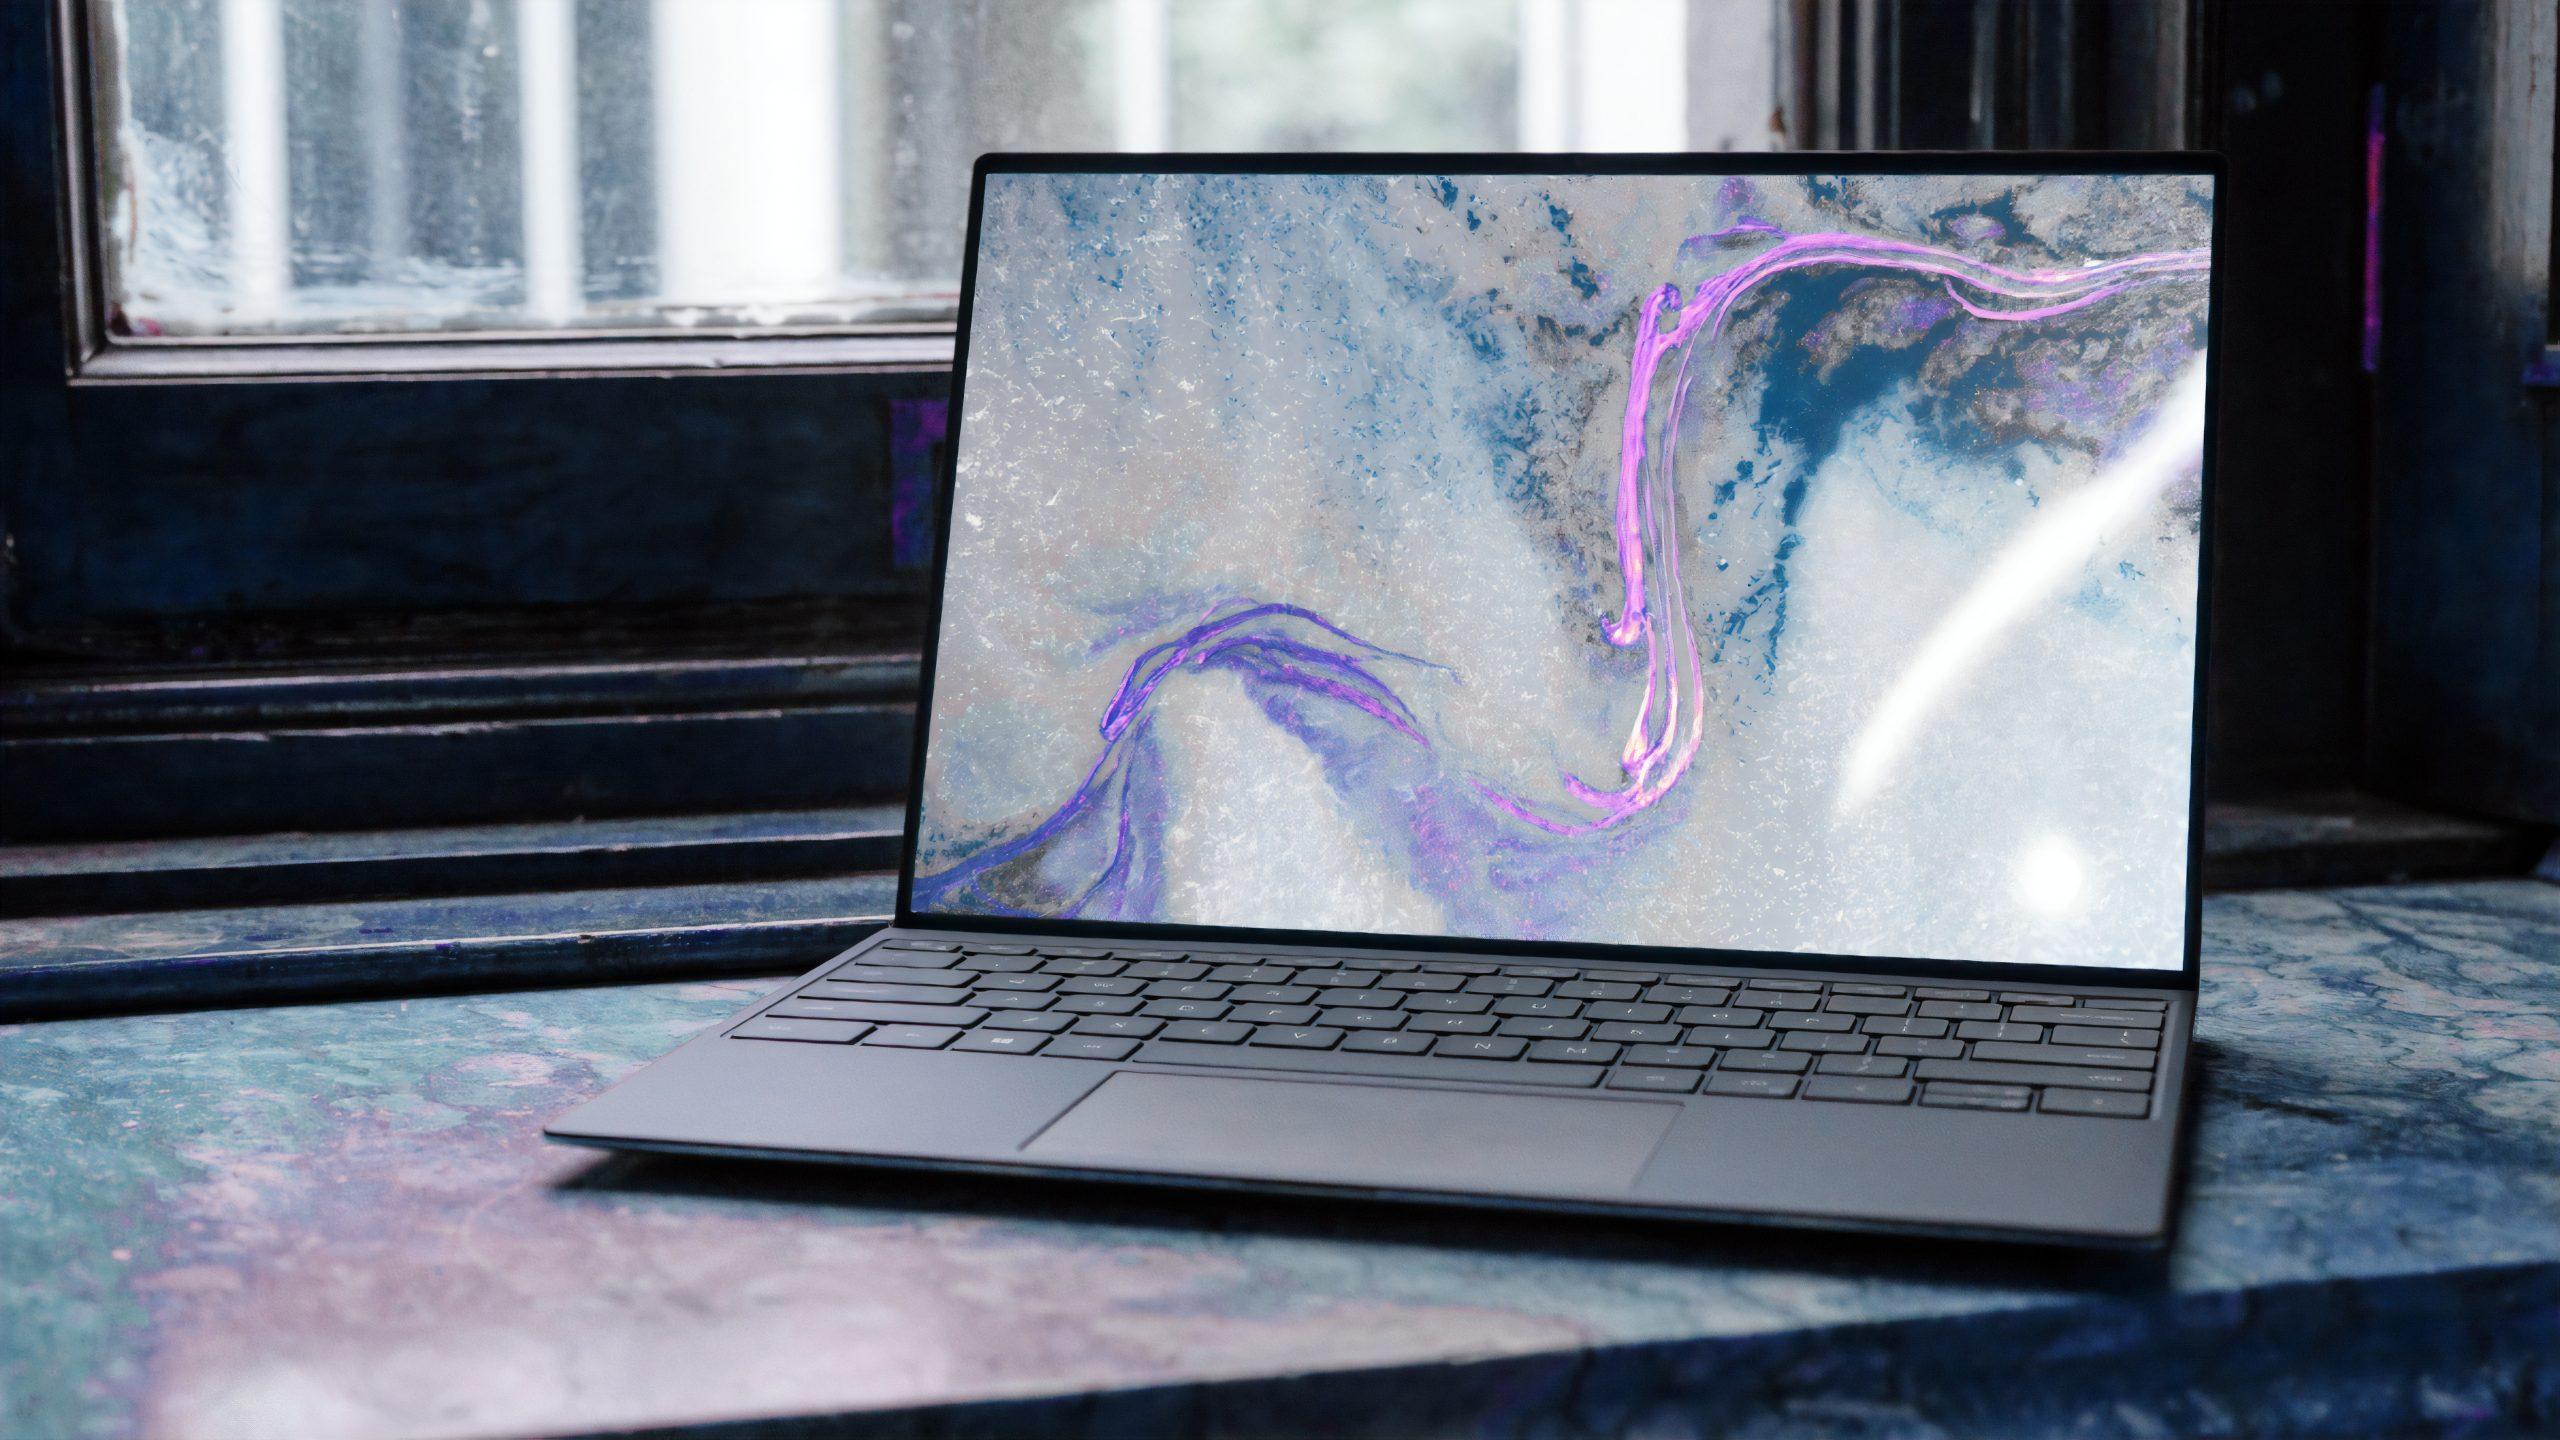 moderne laptopcomputer